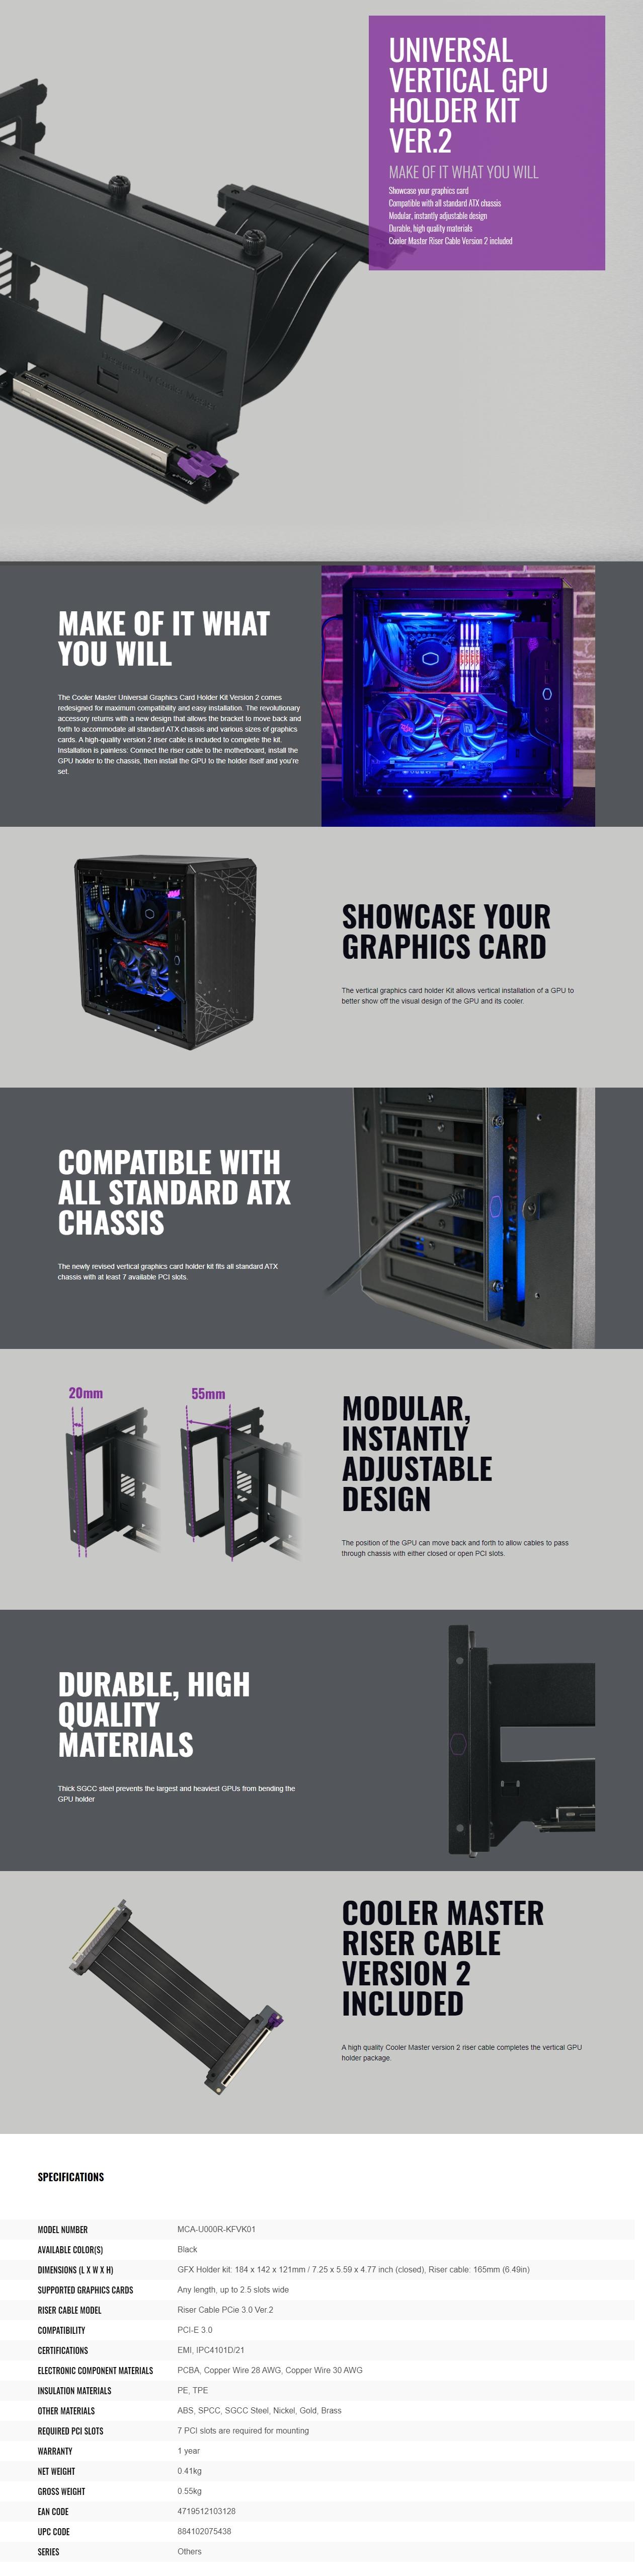 Kit de Soporte Vertical para GPU Cooler Master